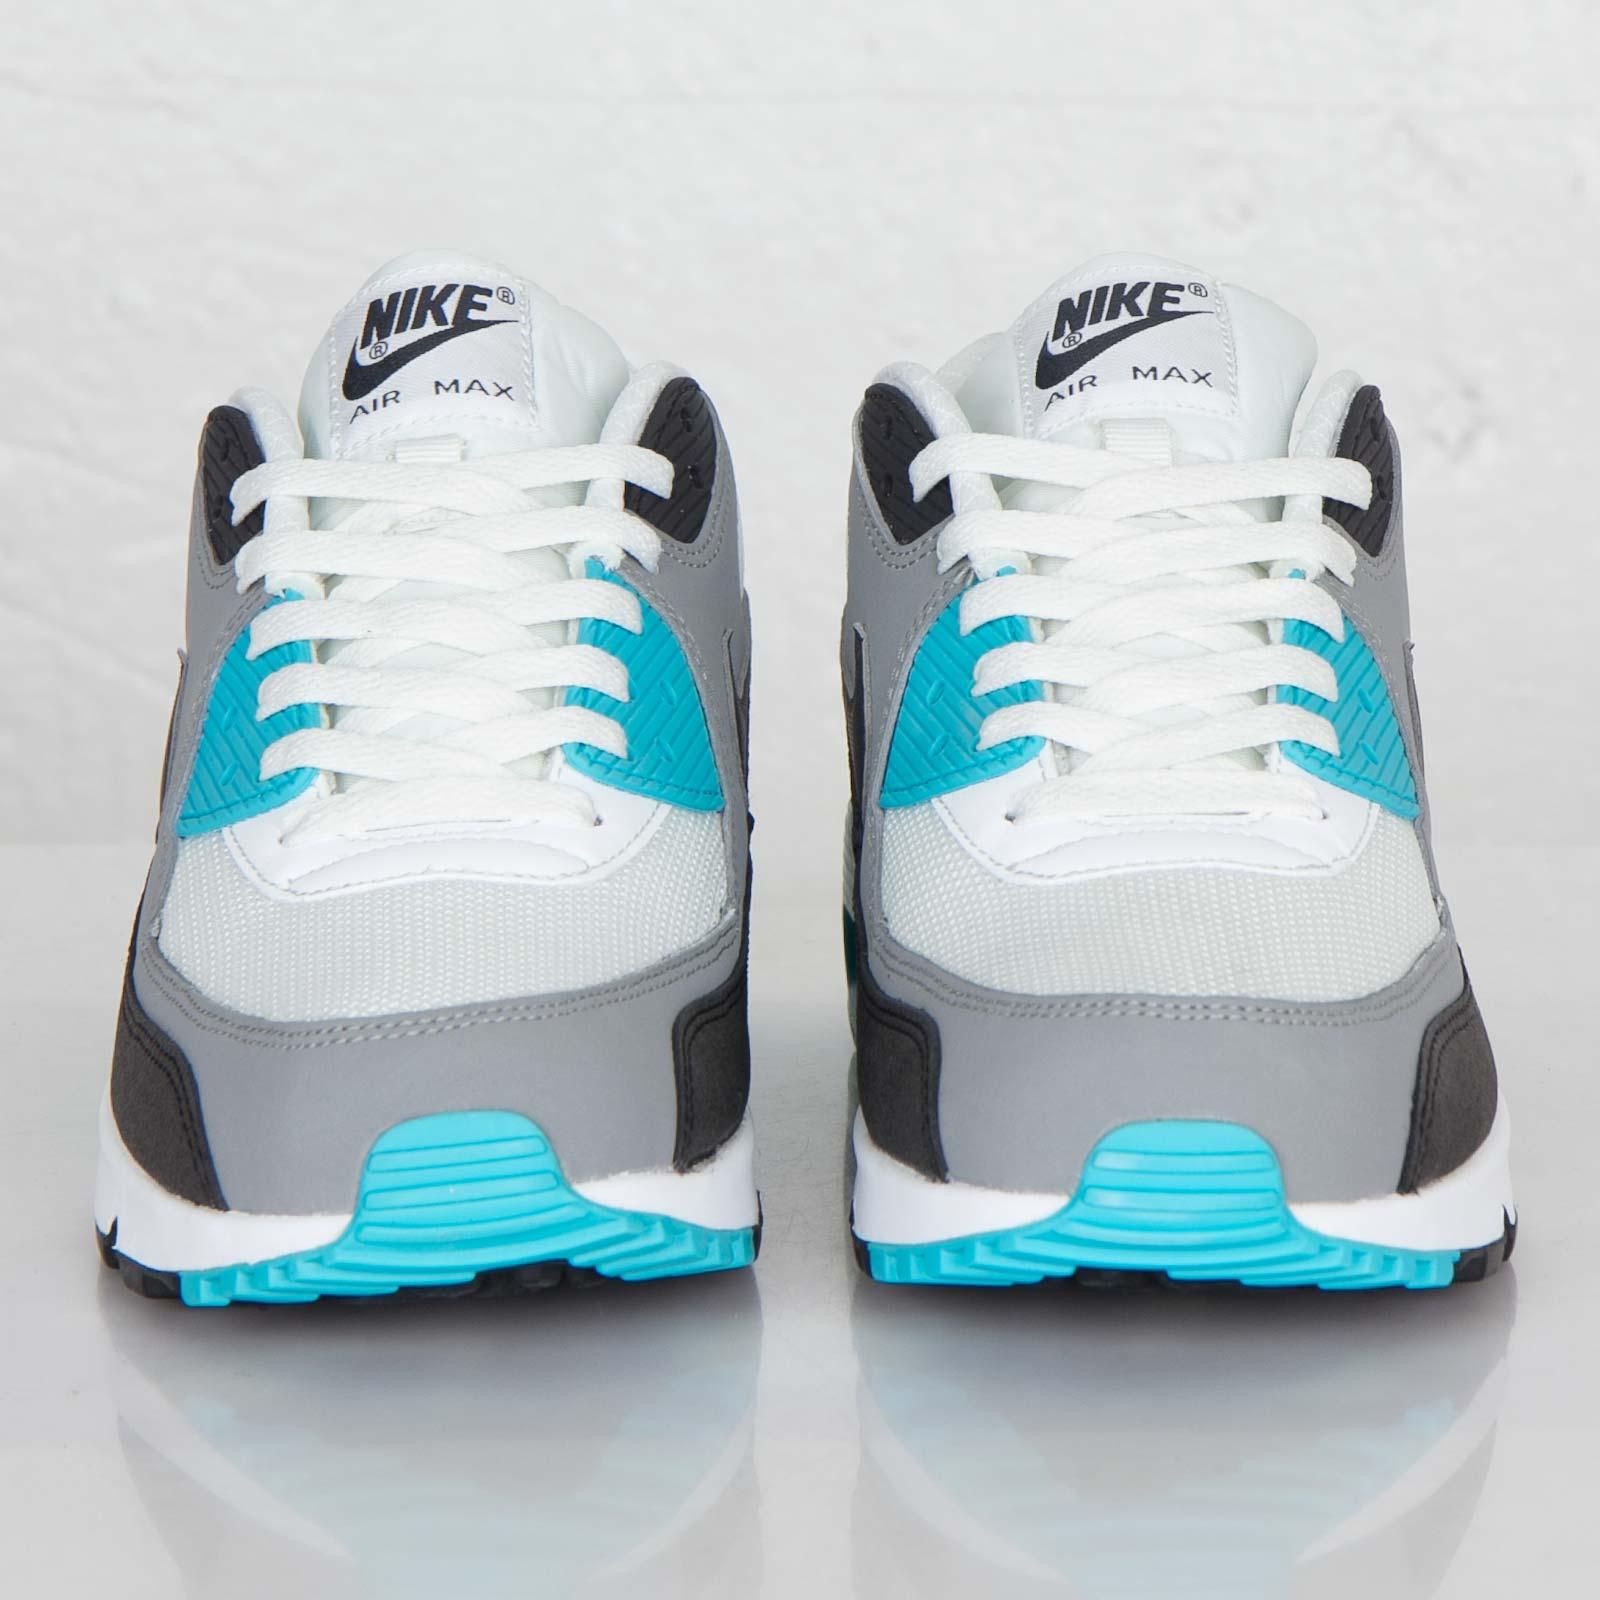 Nike Air Max 90 Essential - 537384-100 - SNS   sneakers ...